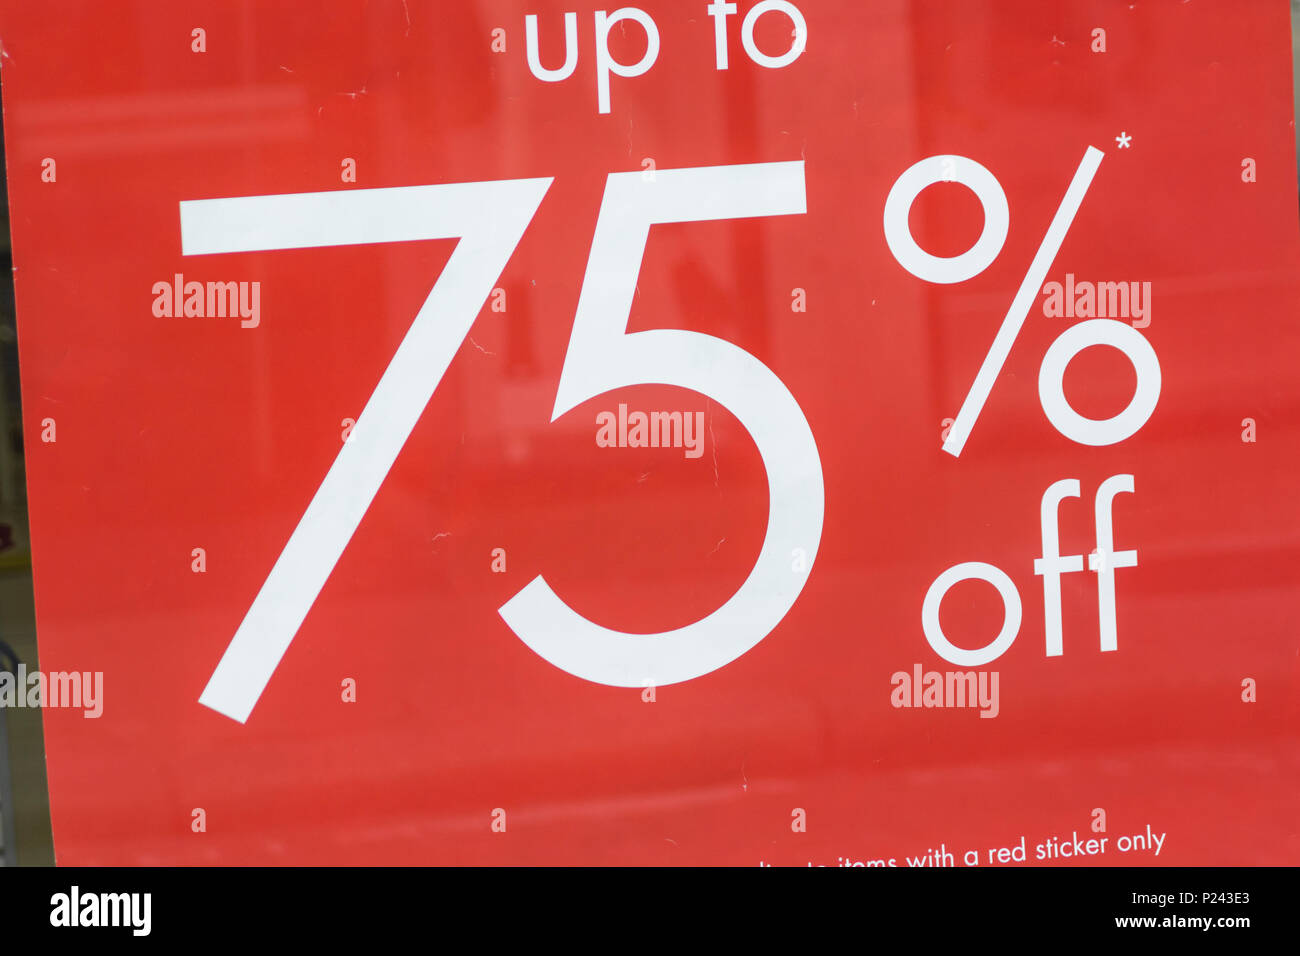 Summer sales sign in Truro (Cornwall) shop window. Metaphor high street squeeze, retail squeeze. Stock Photo